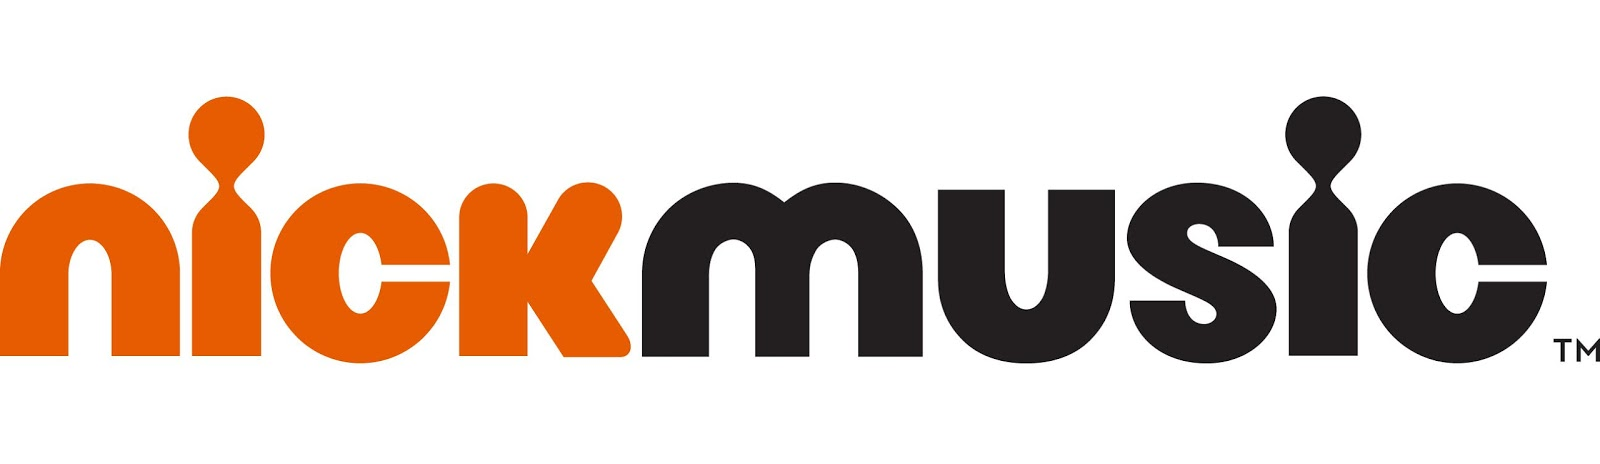 nickmusic logo